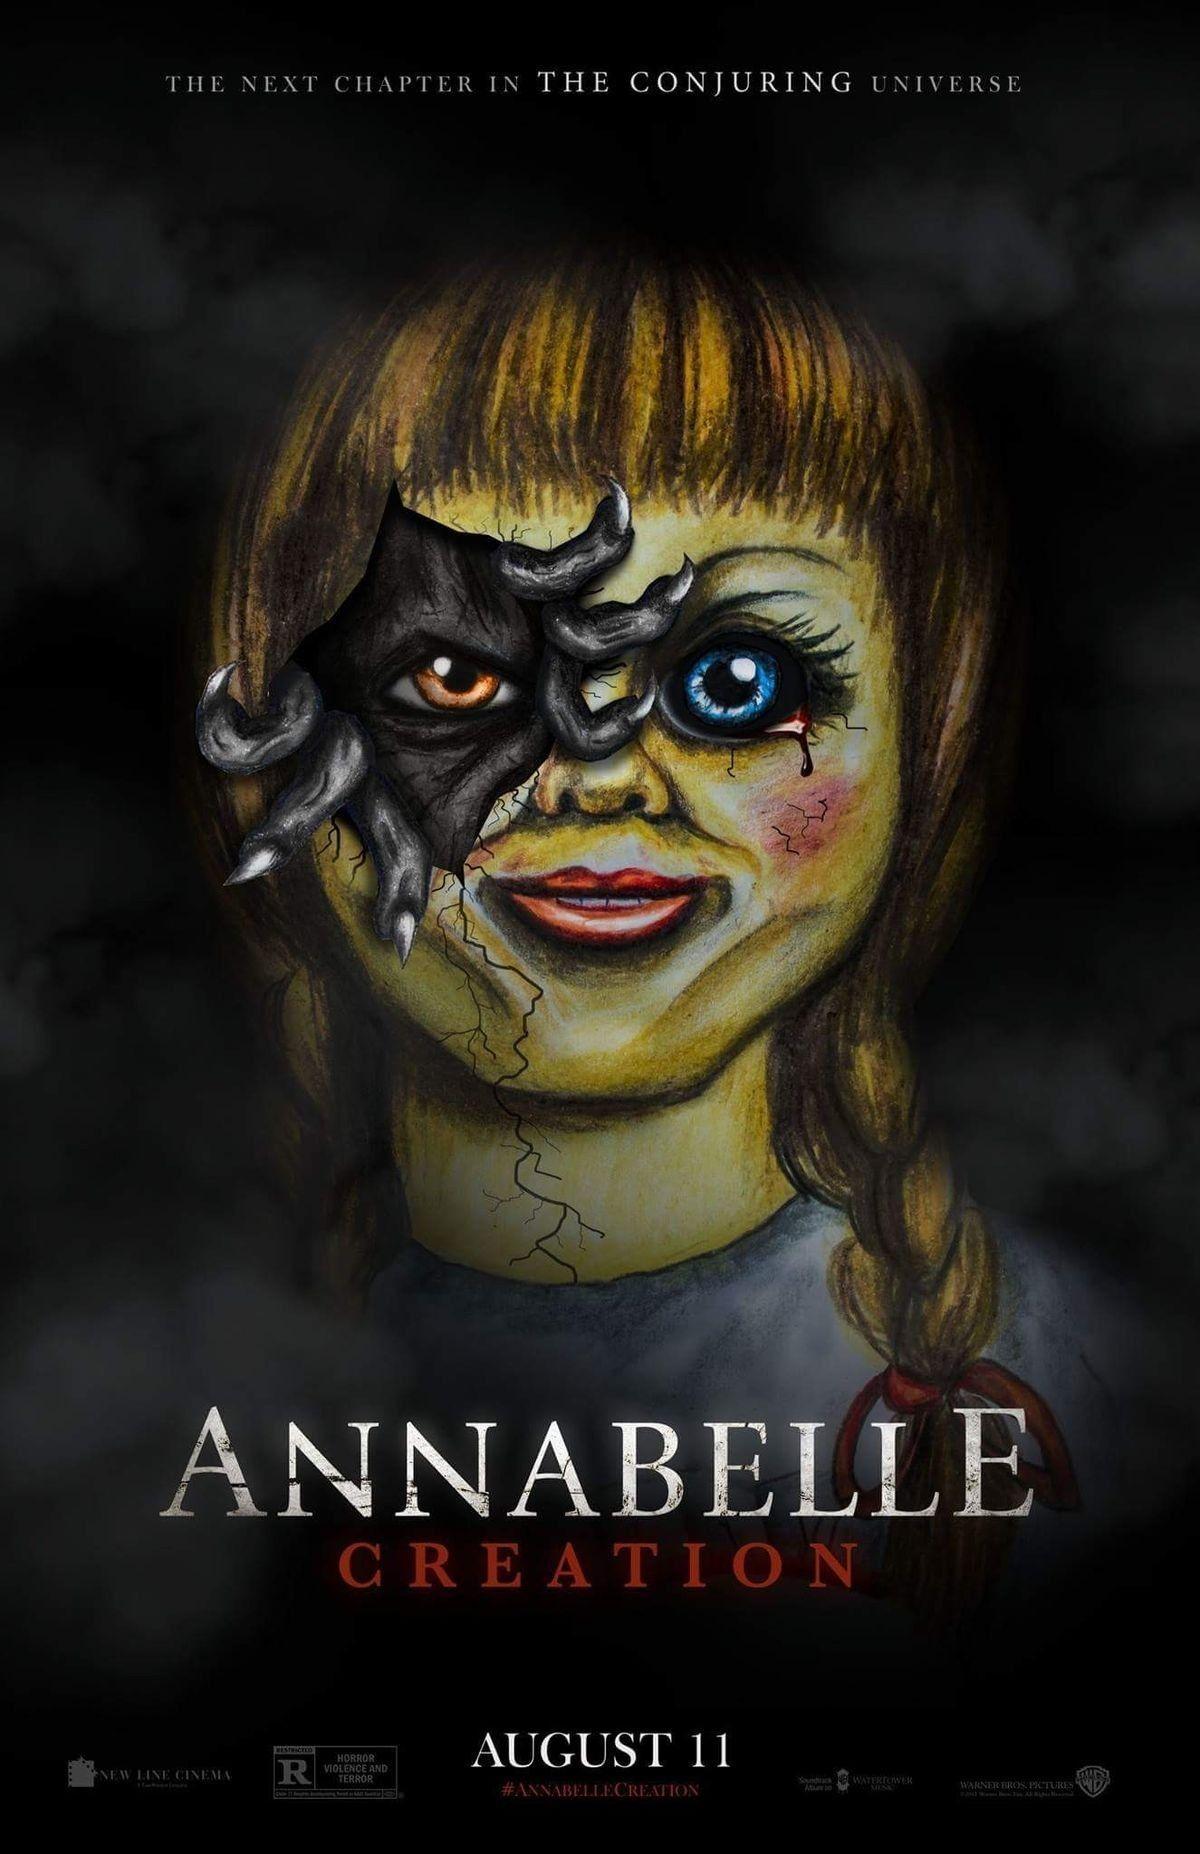 Annabelle Movie Poster Horror Movie Posters Film Horor Horor